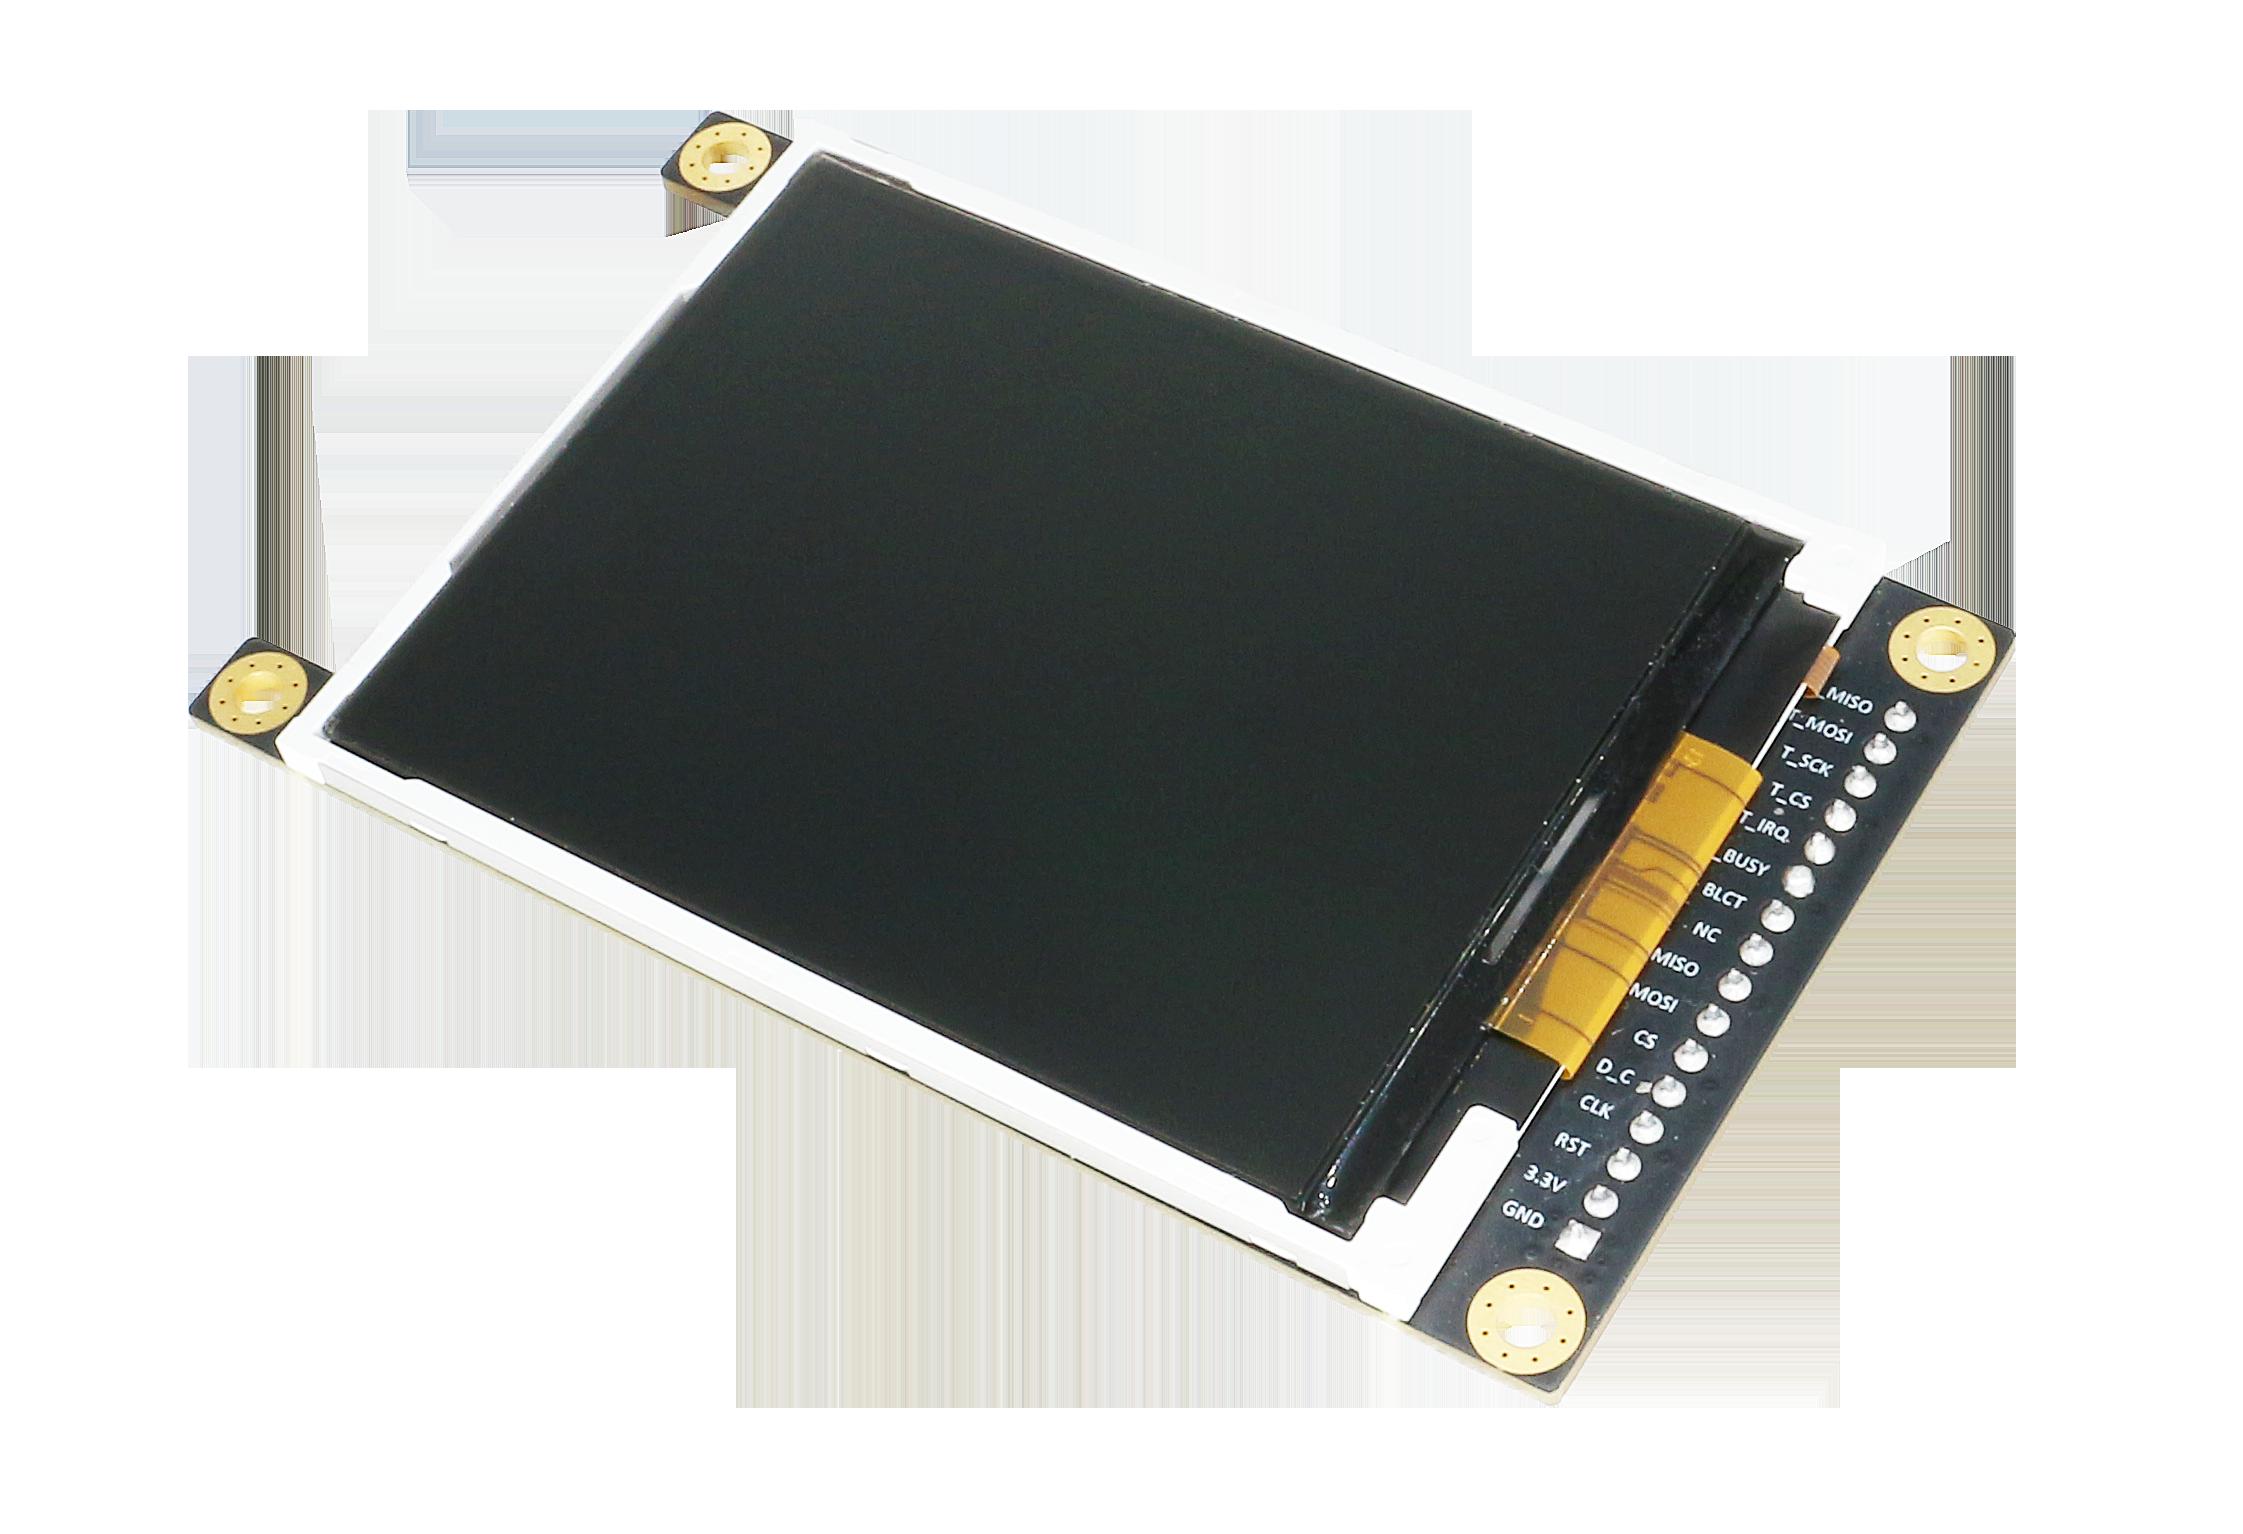 ESP-LyraP-LCD32